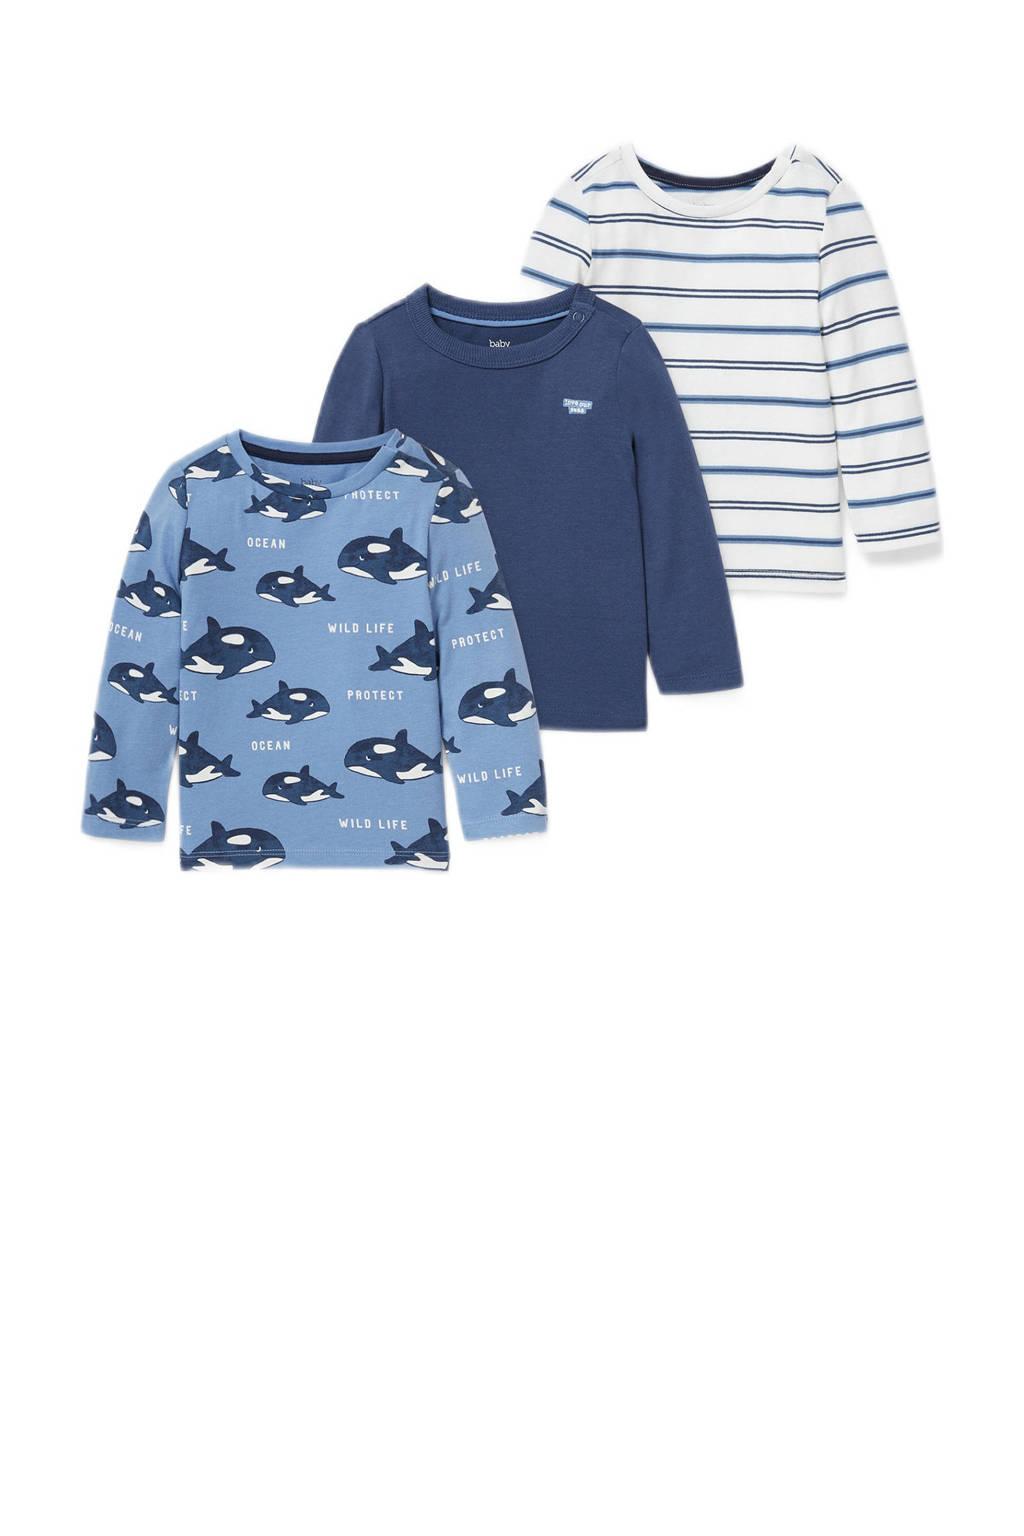 C&A Baby Club longsleeve - set van 3 blauw/wit, Blauw/wit